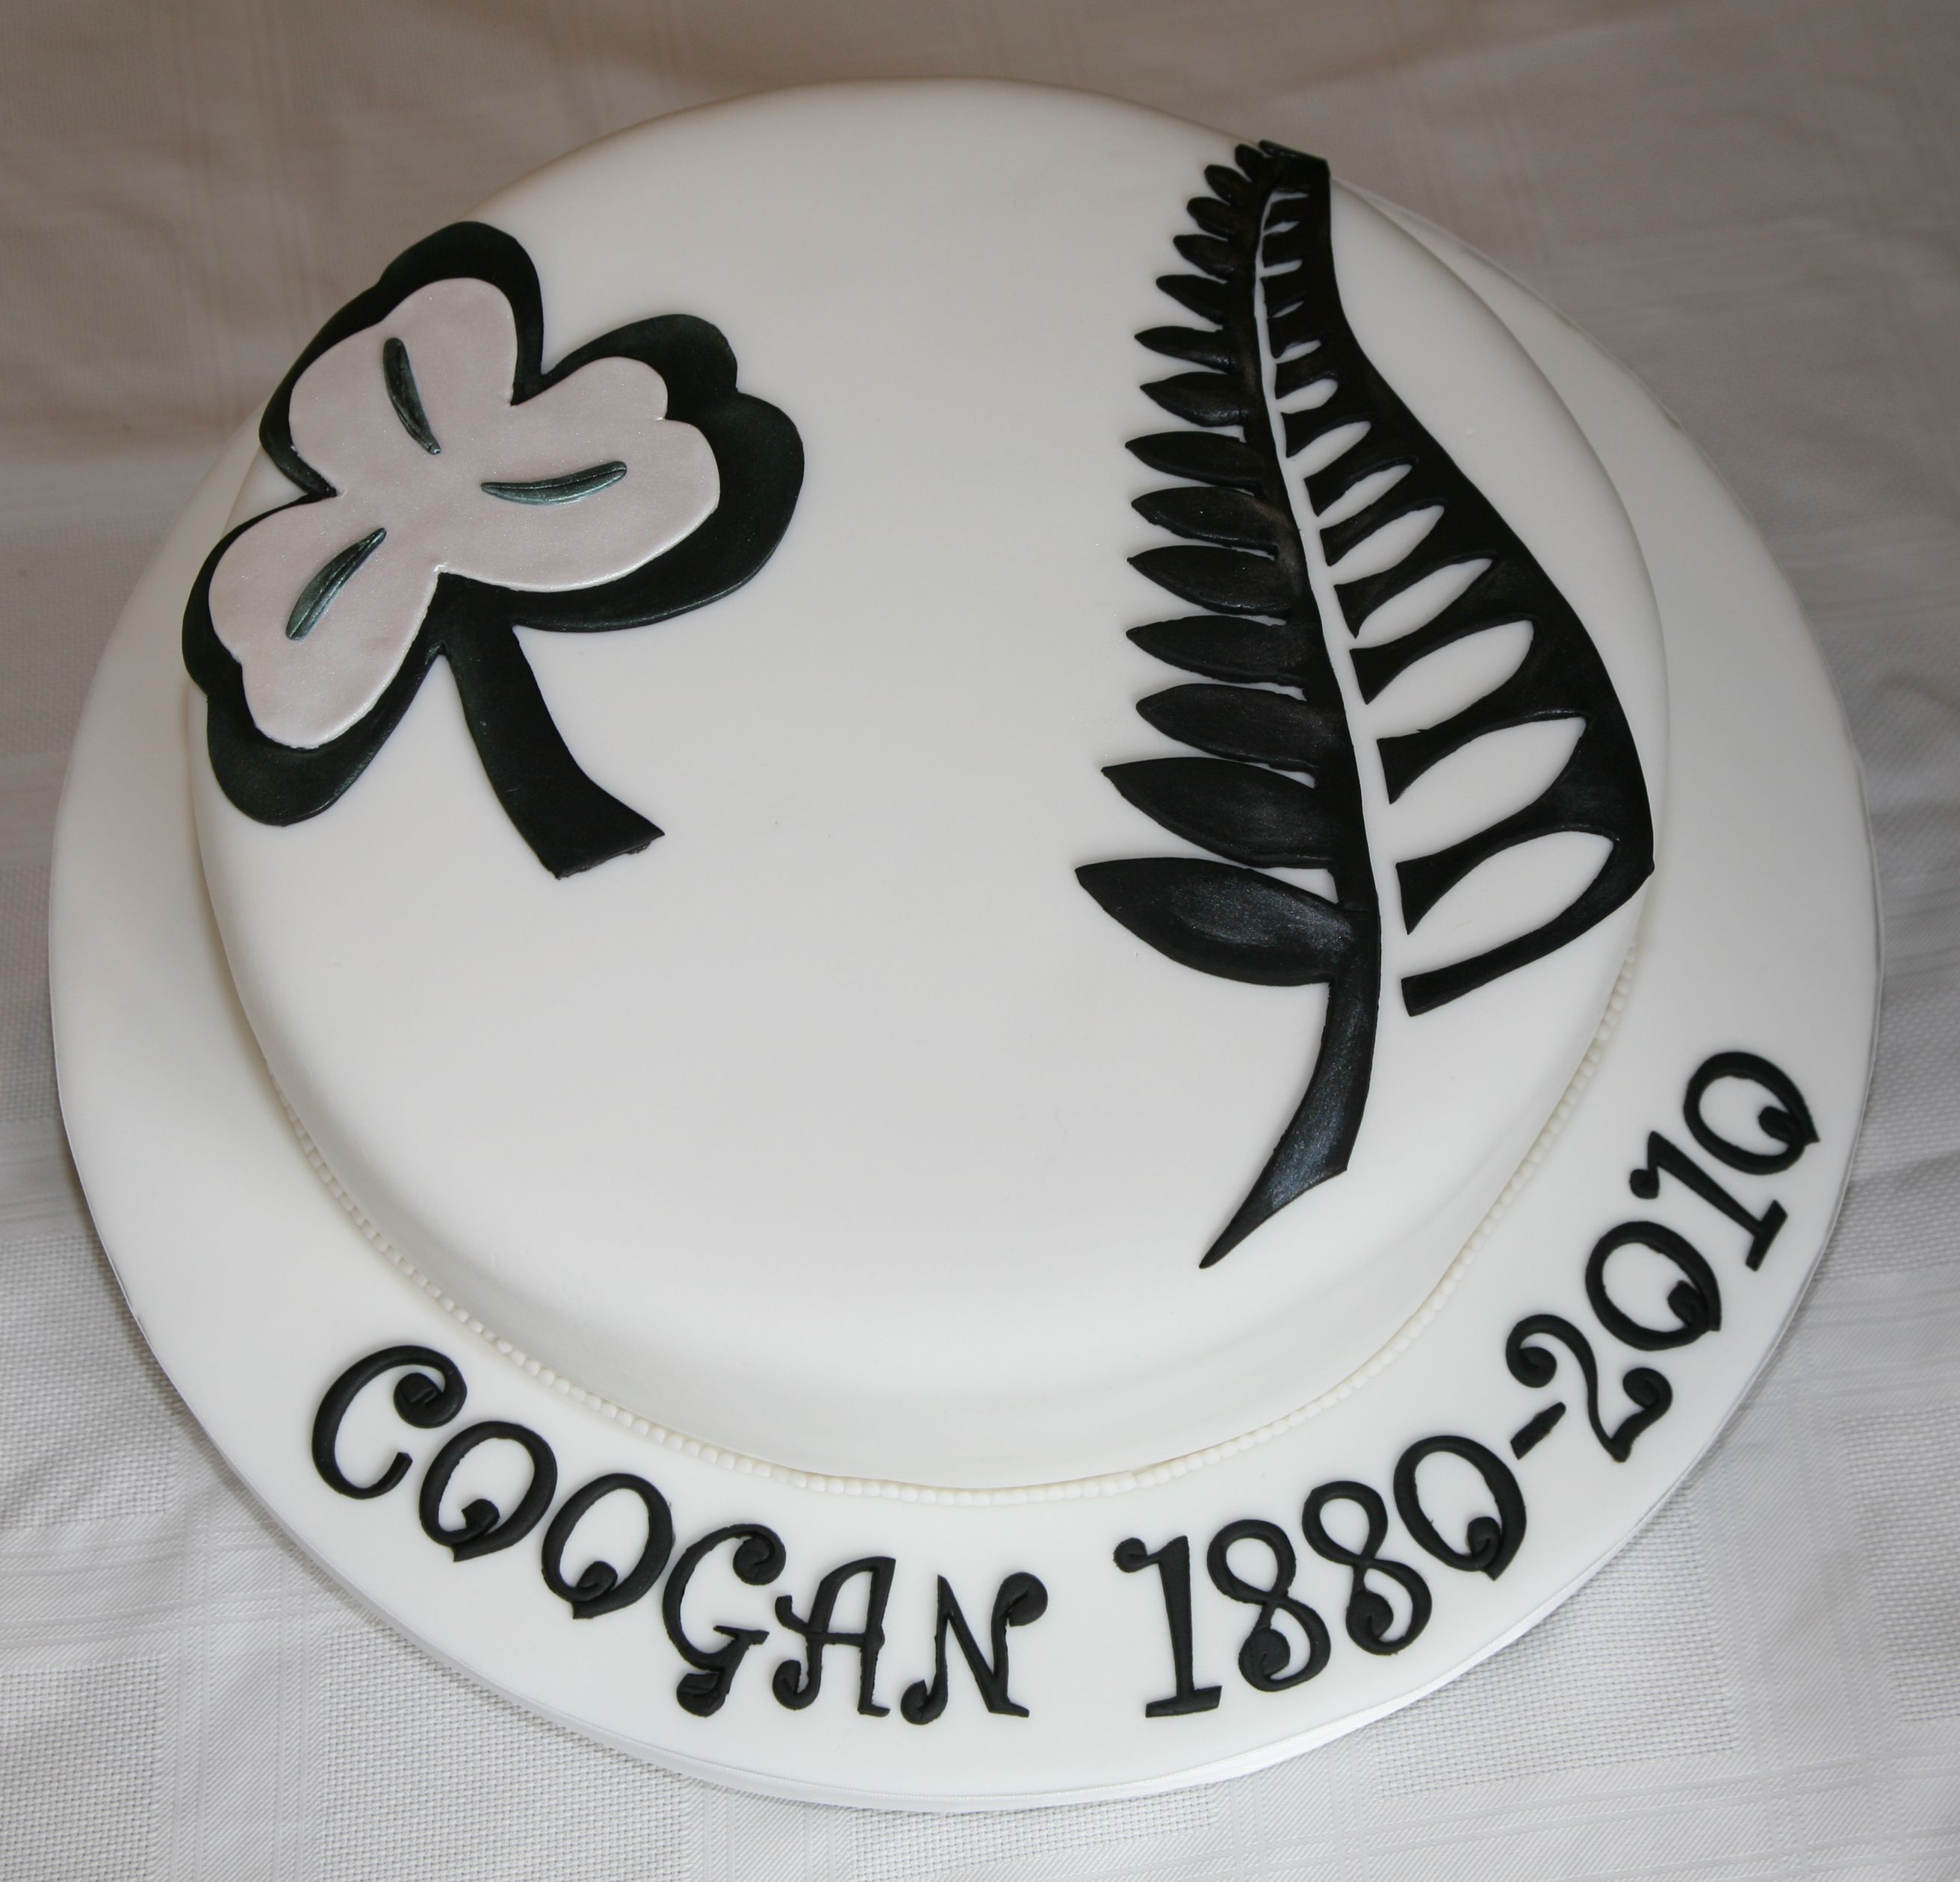 From Ireland To New Zealand Family Reunion Cake